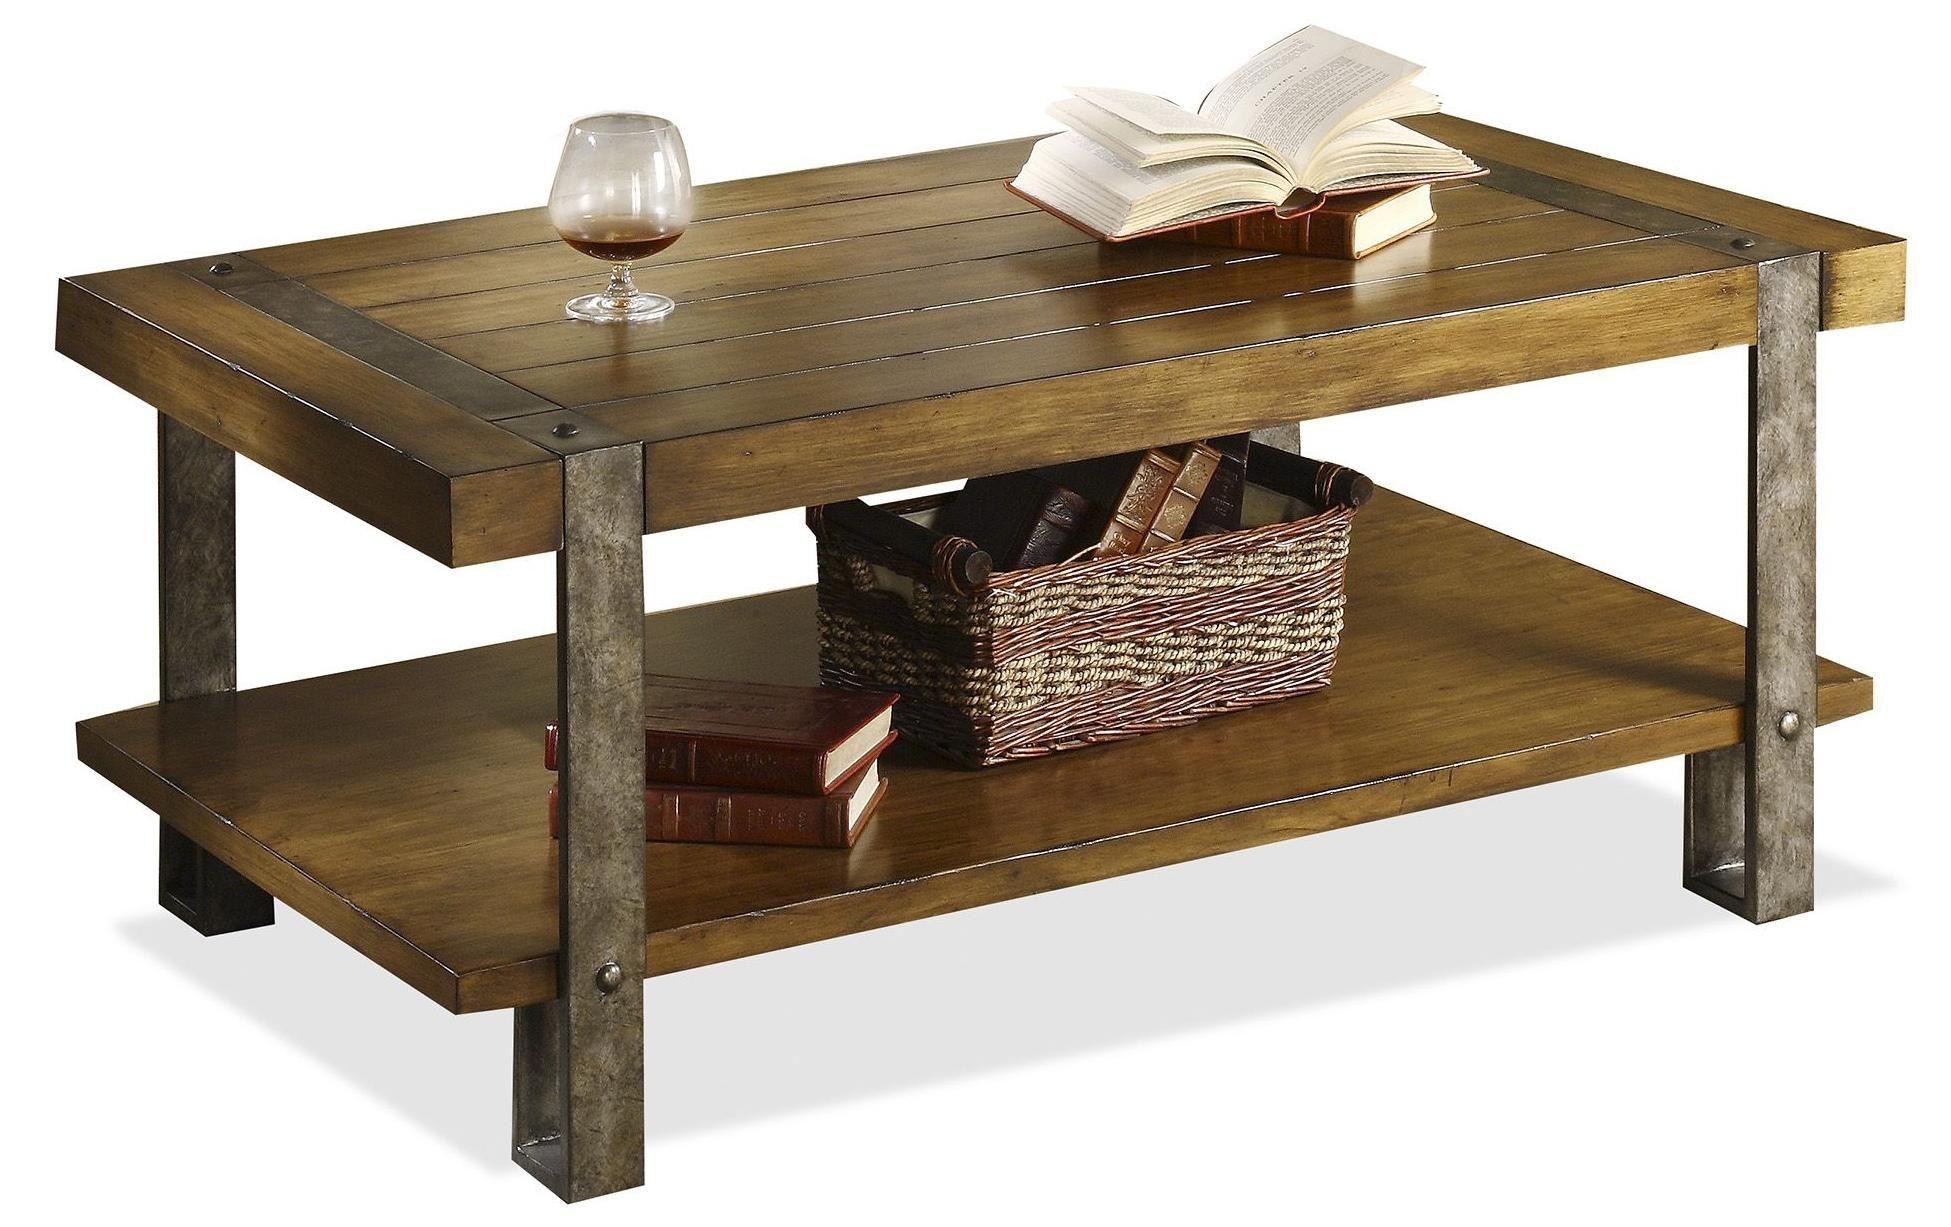 Sierra sierra coffee table by riverside furniture a striking